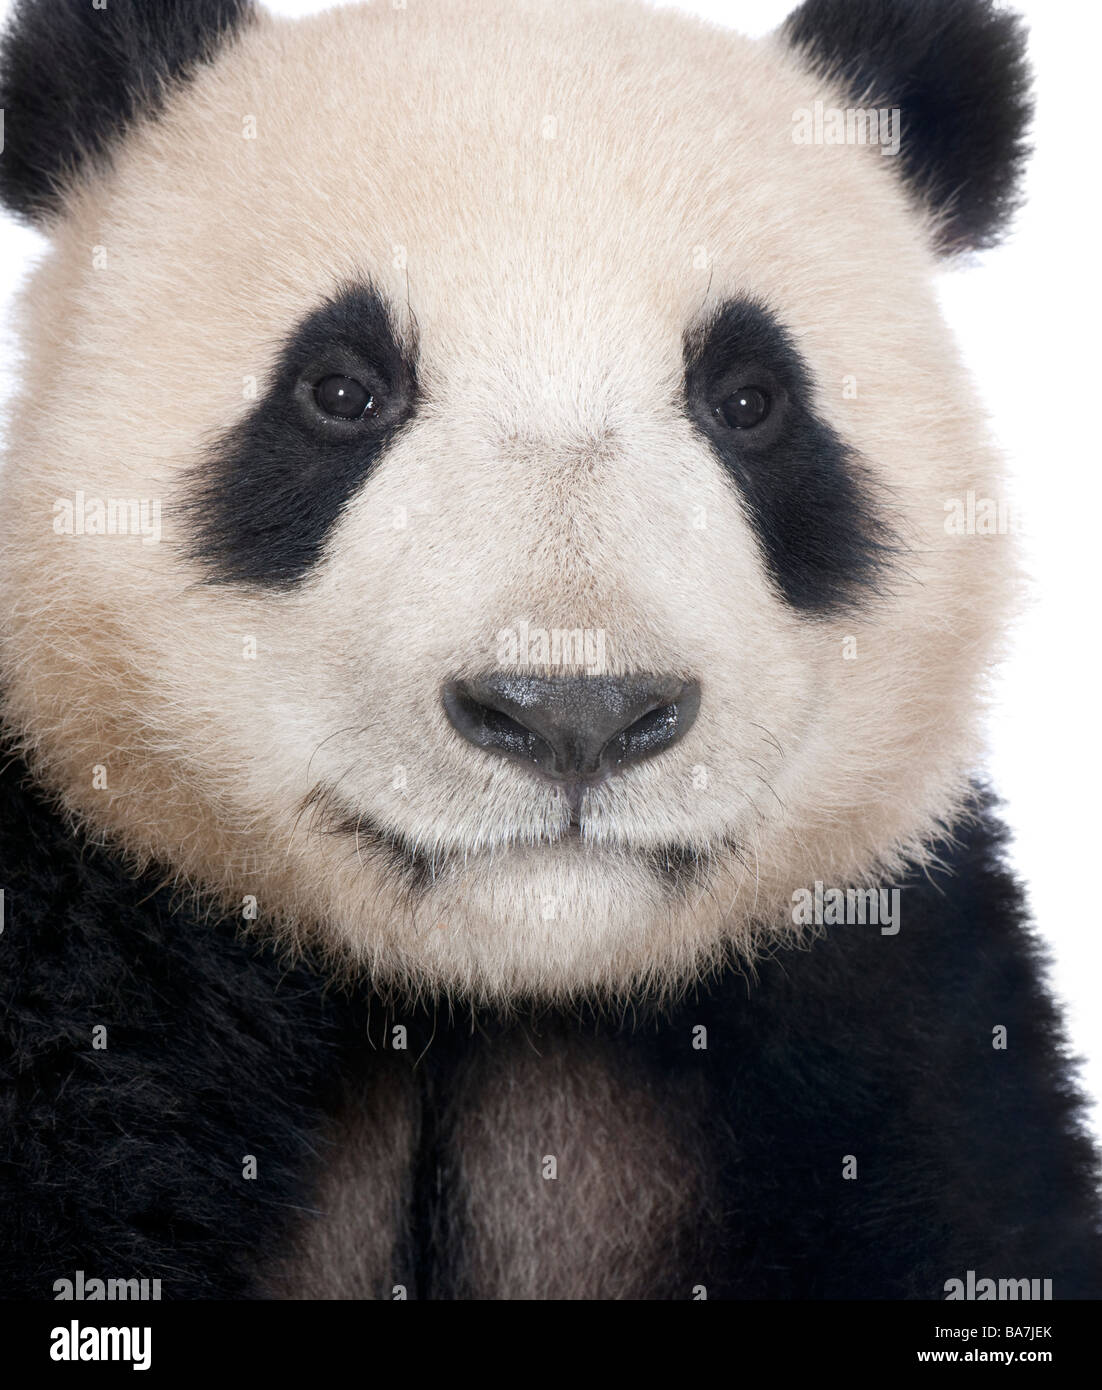 Panda gigante (18 meses) - Ailuropoda melanoleuca delante de un fondo blanco. Imagen De Stock